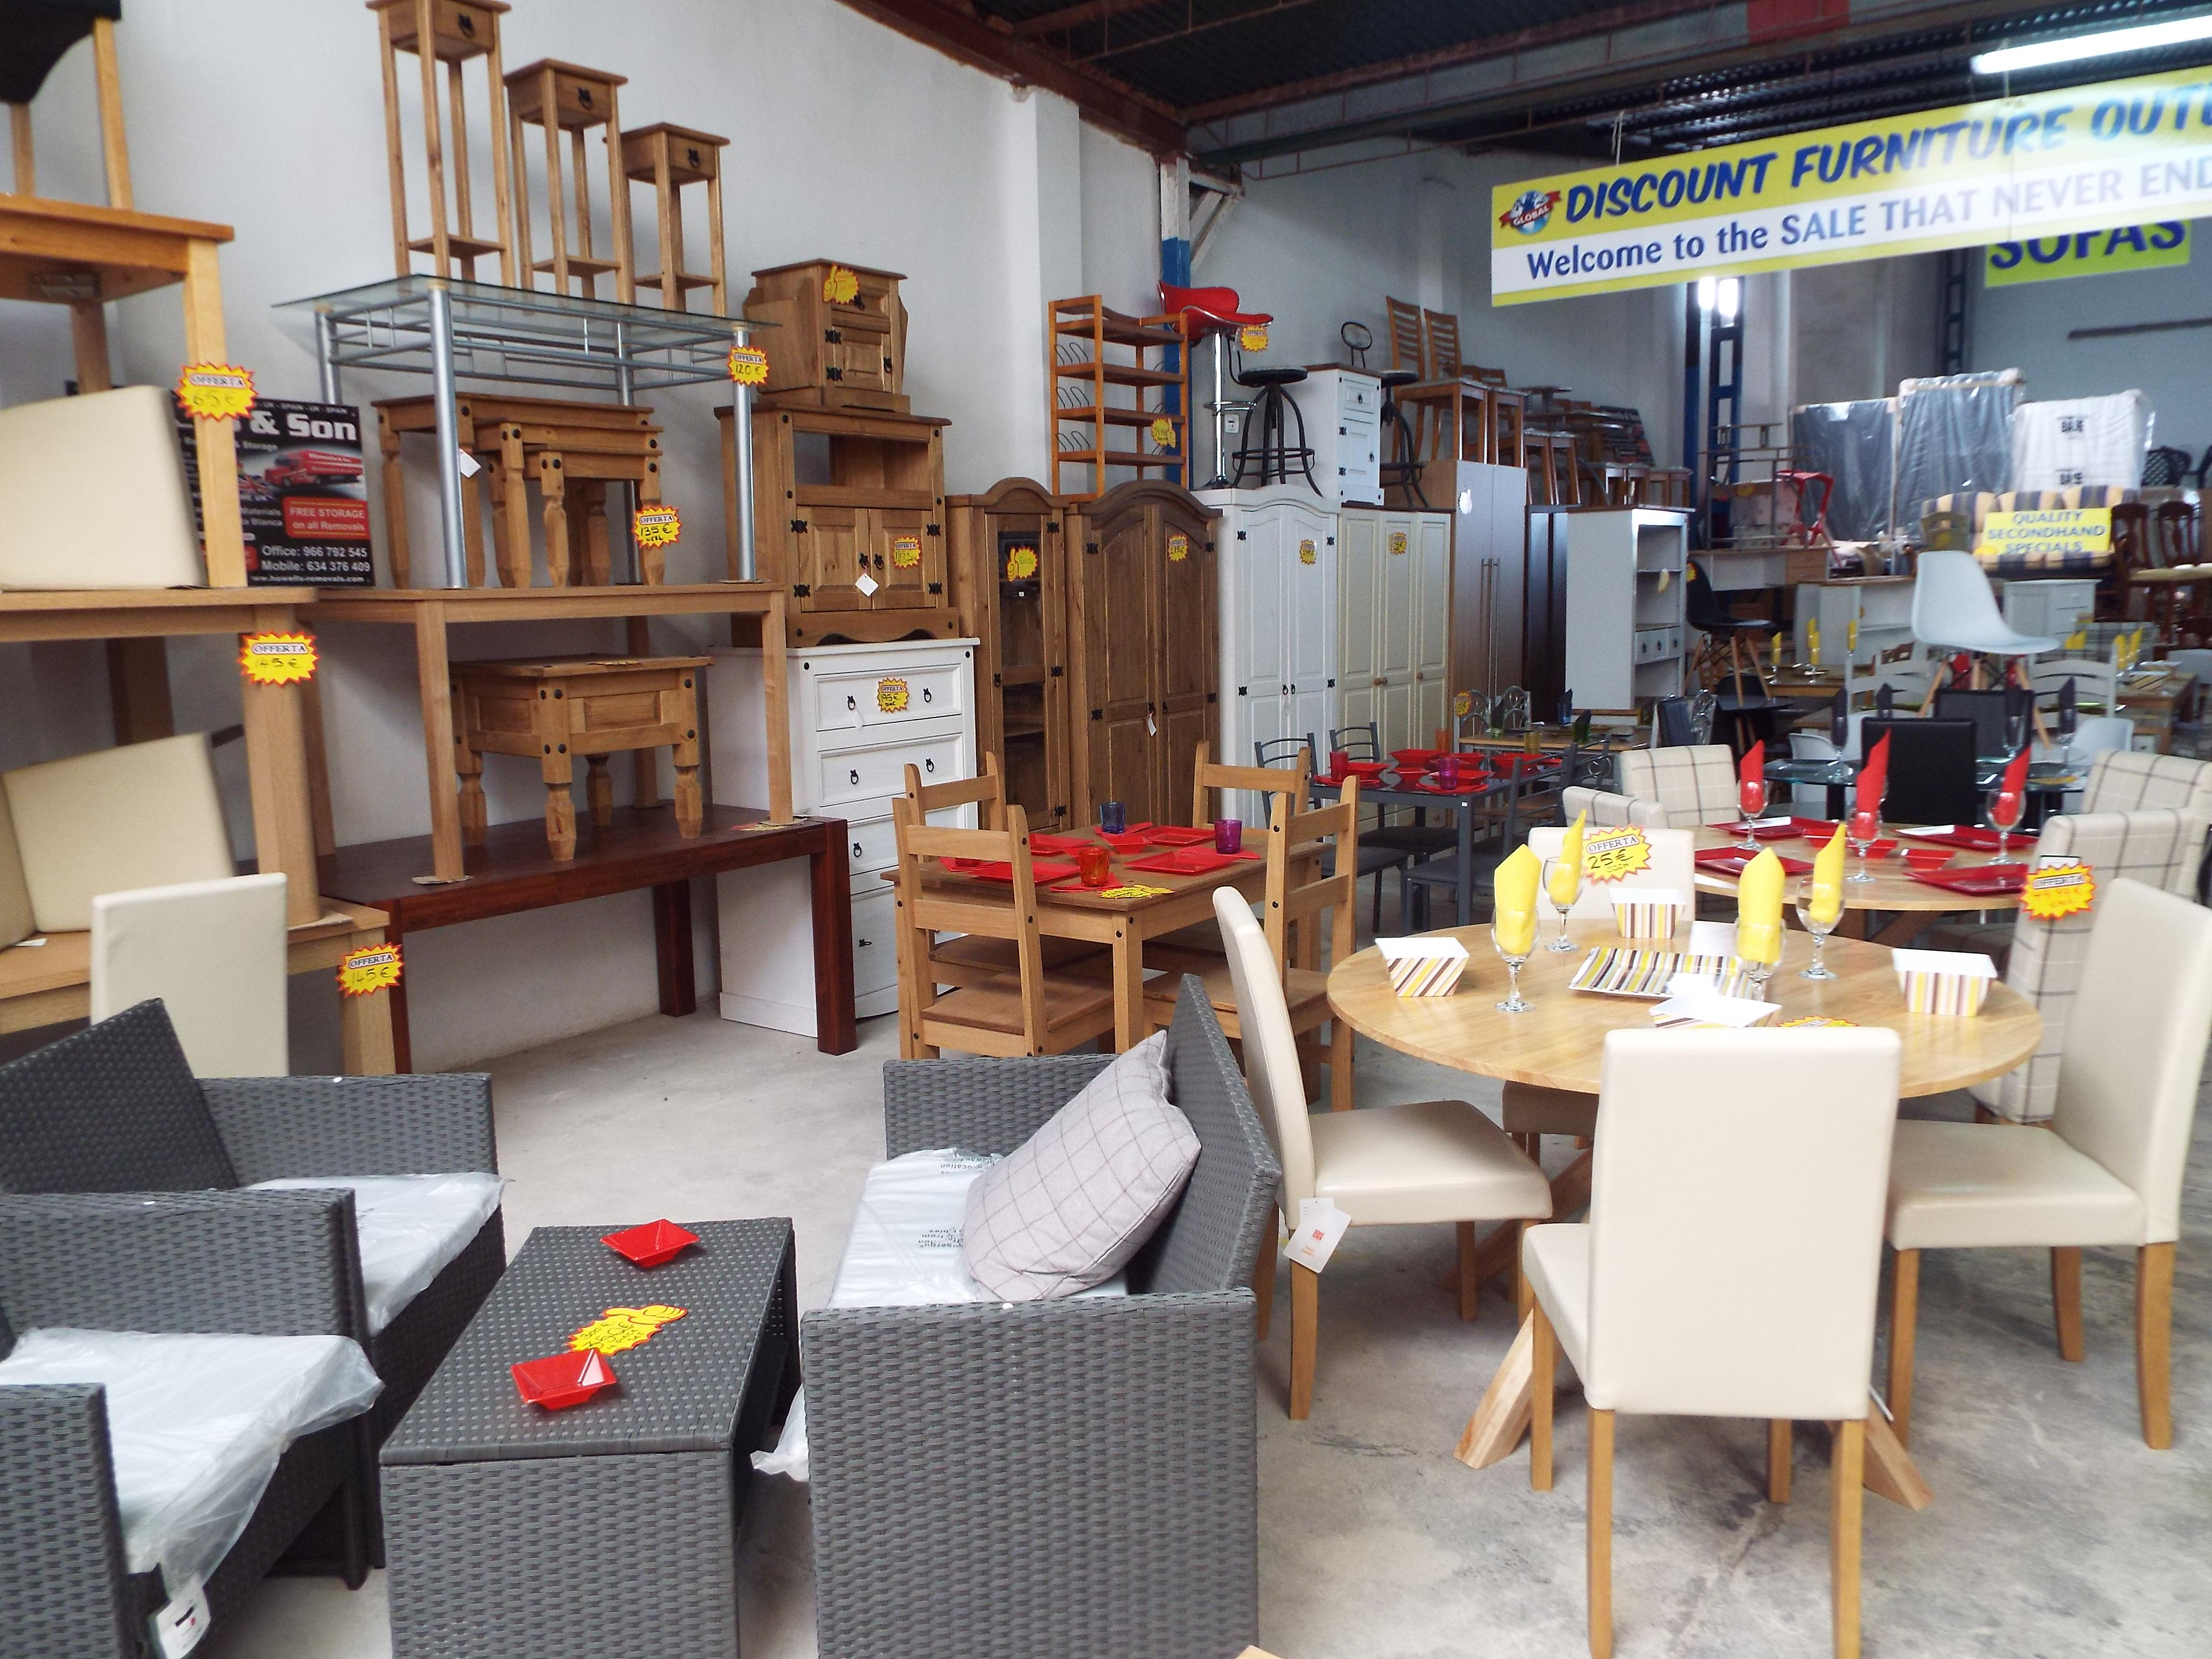 No Acabamos Las Rebajas Nunca Global Discount Furniture Outlet